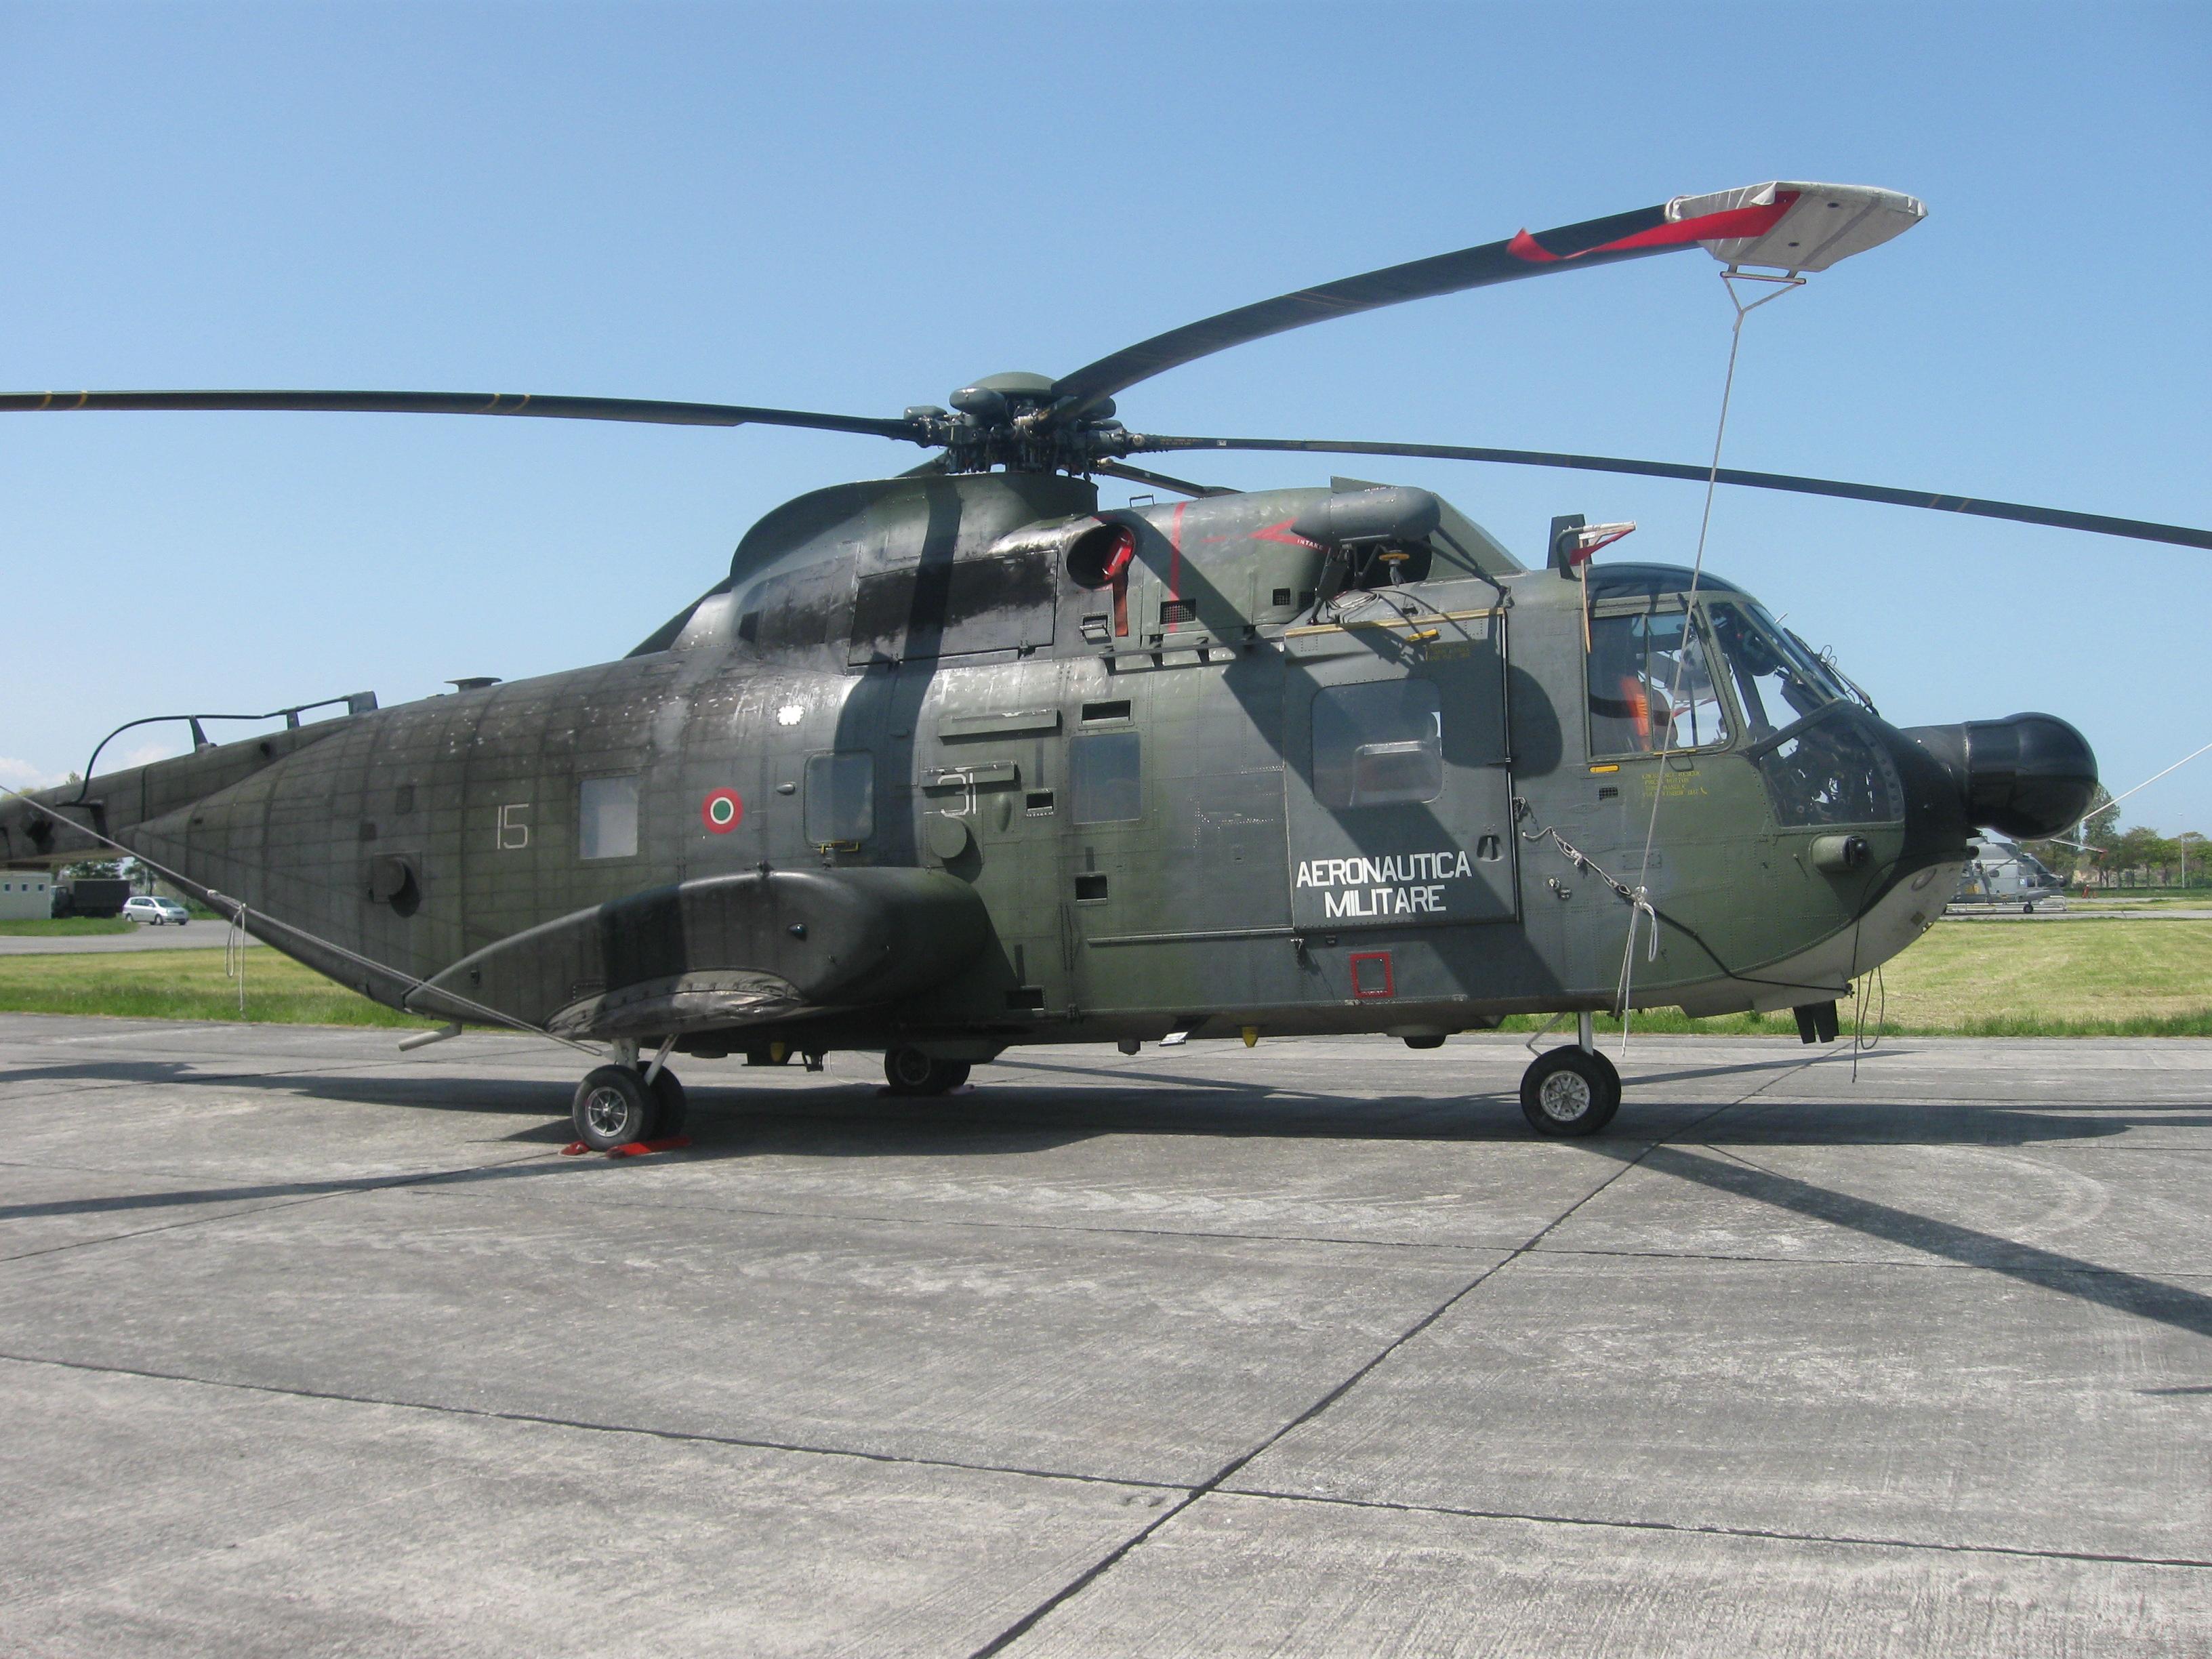 Helico's : divers, photos, infos 1005180812011050246058954